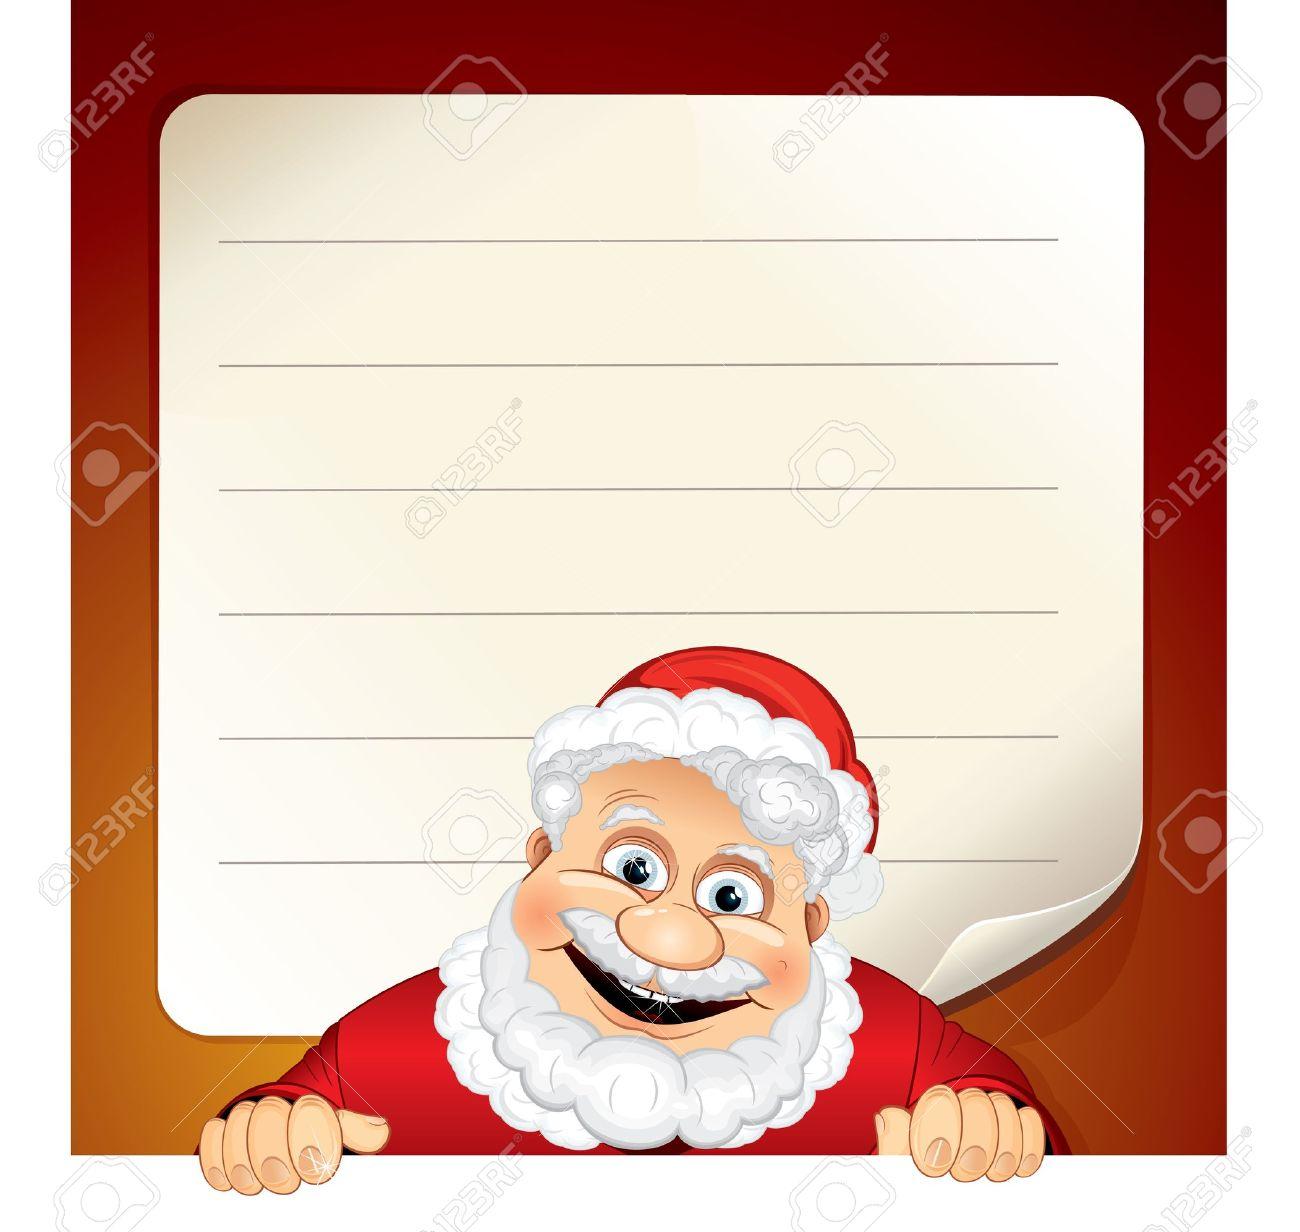 Santa List Template Printable Vosvetenet – Santa List Template Printable